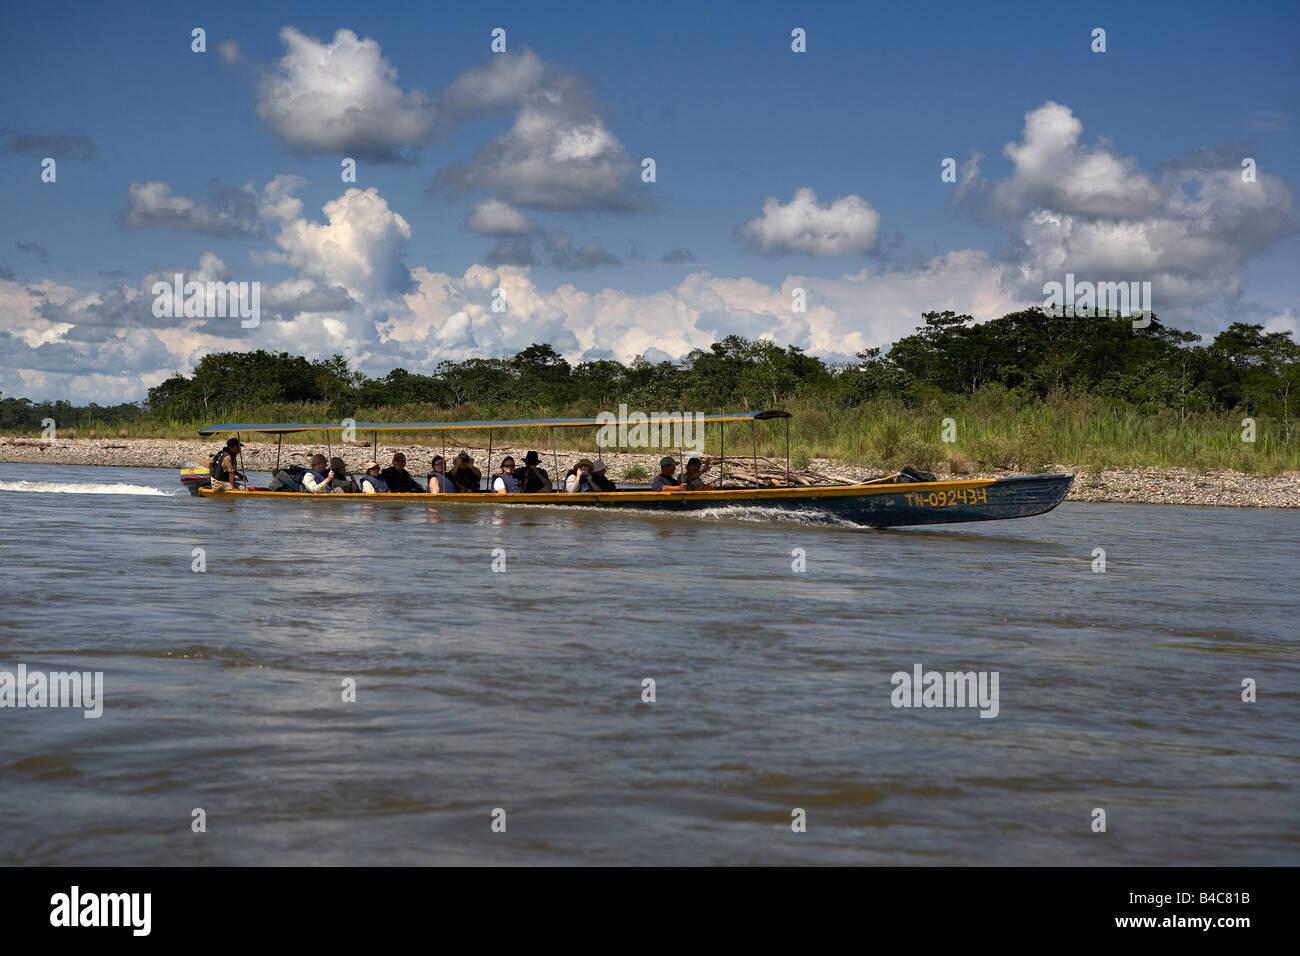 Taxi on Napo River, Amazon Rain Forest, Ecuador - Stock Image